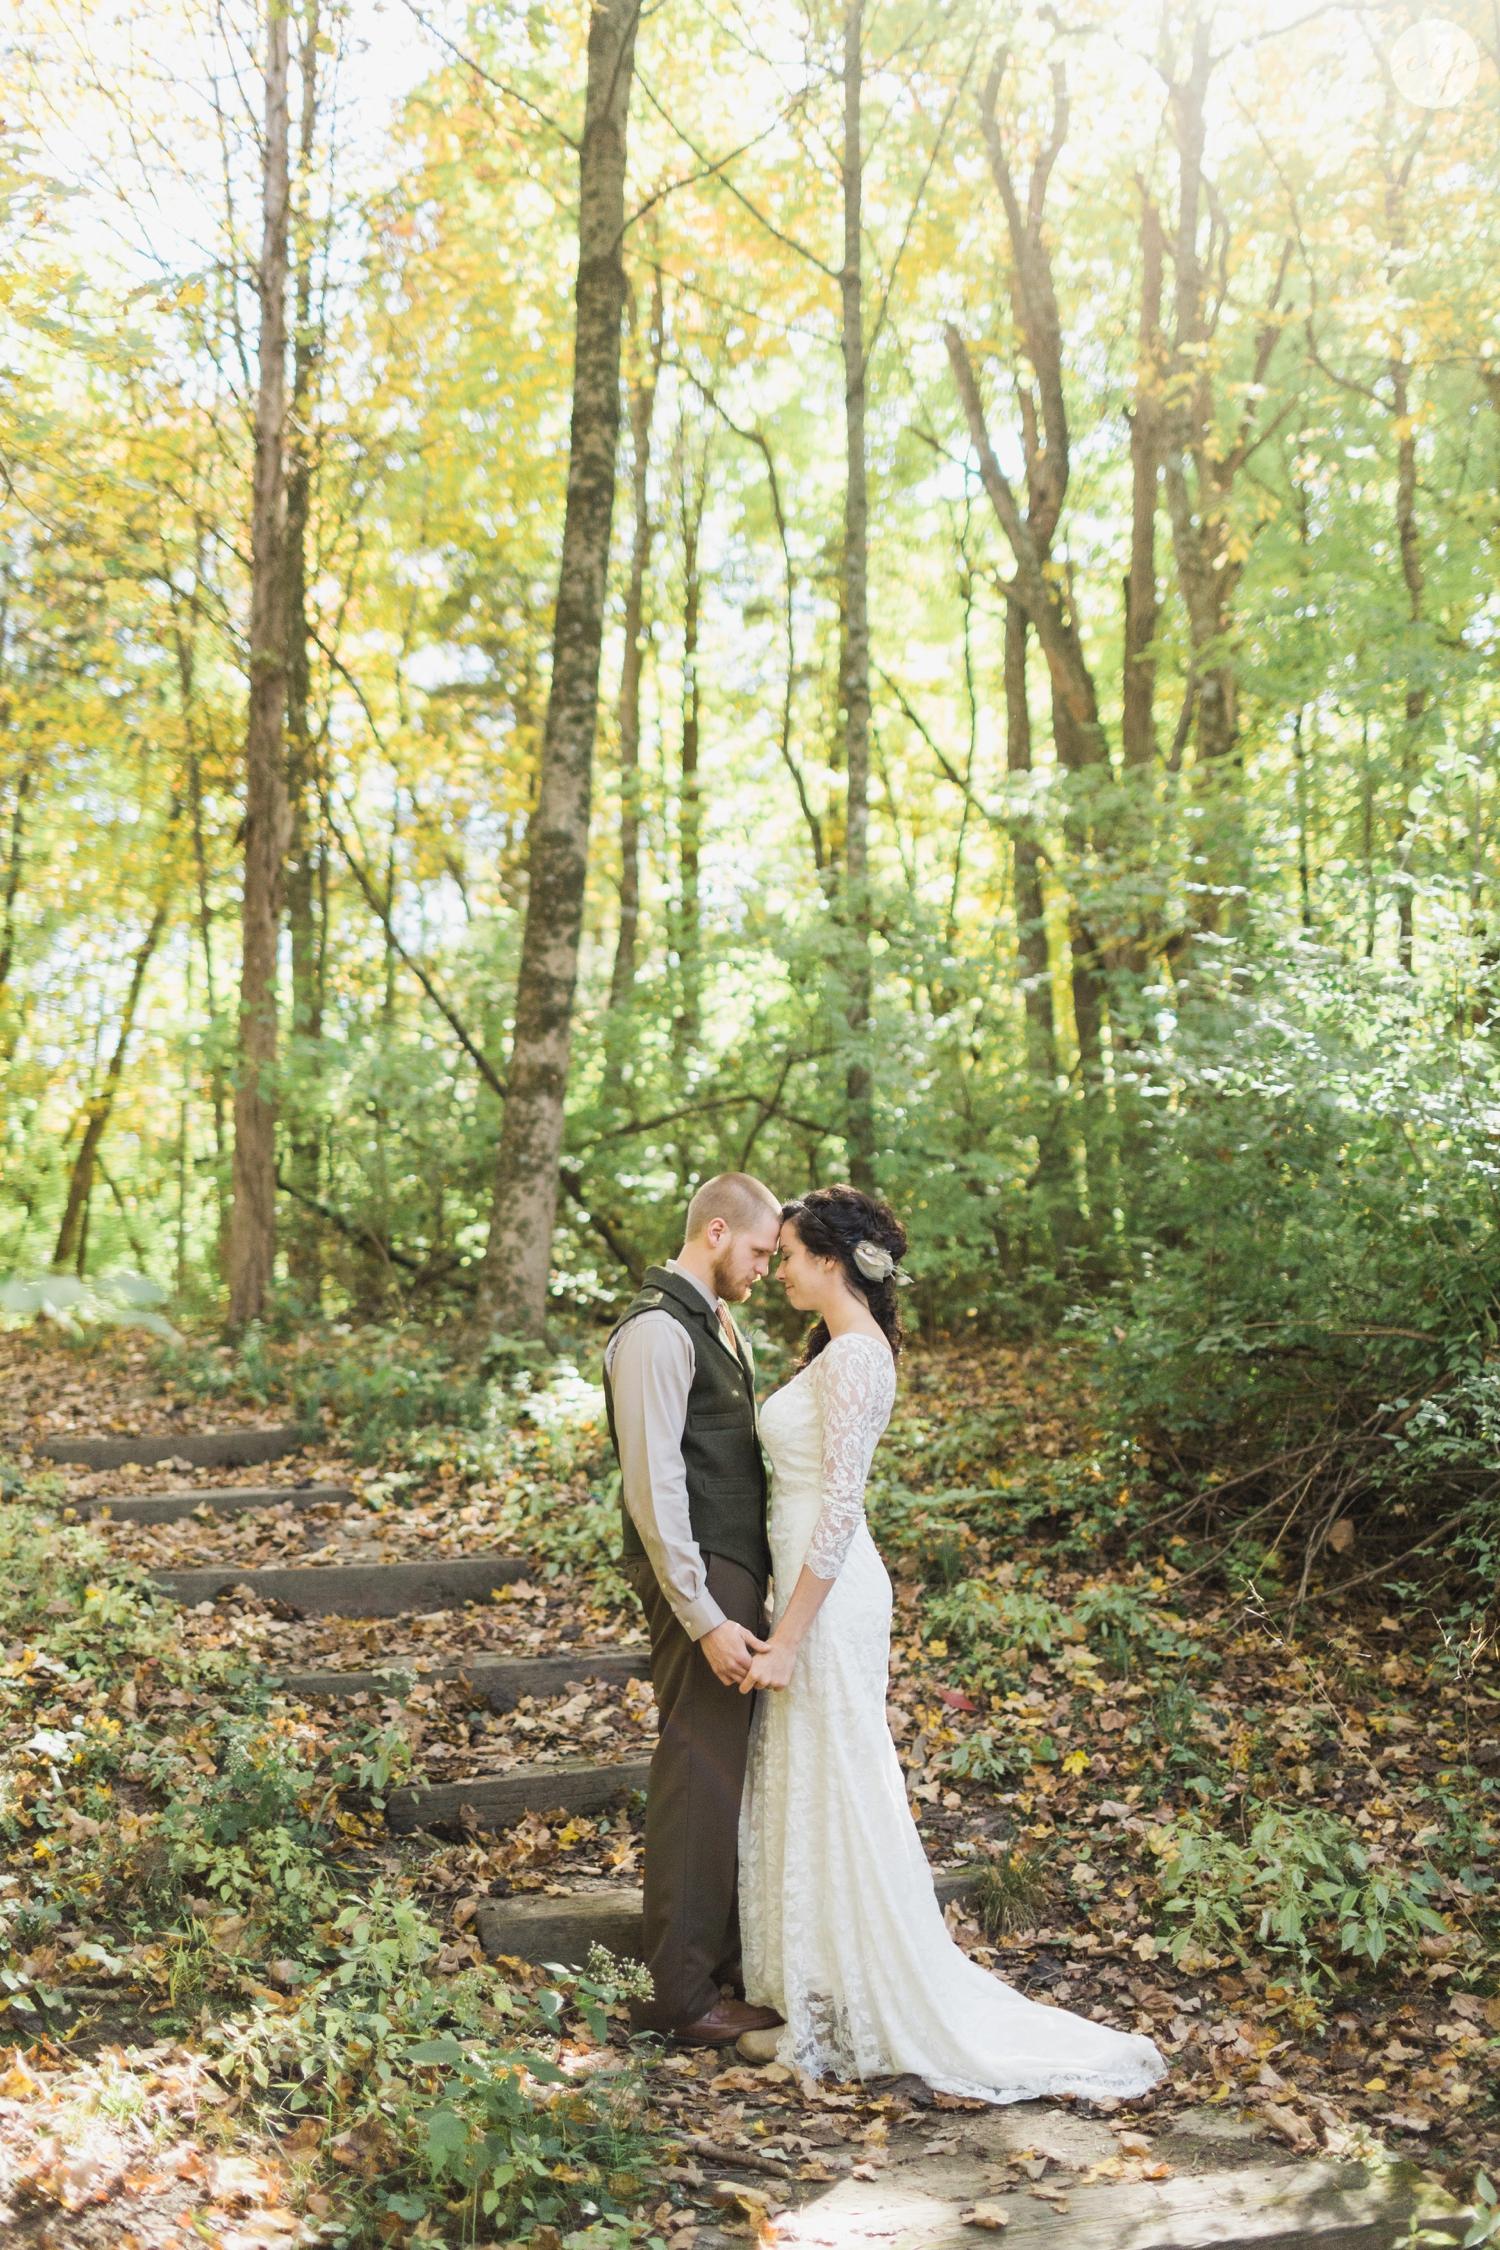 Outdoor-Wedding-in-the-Woods-Photography_4215.jpg